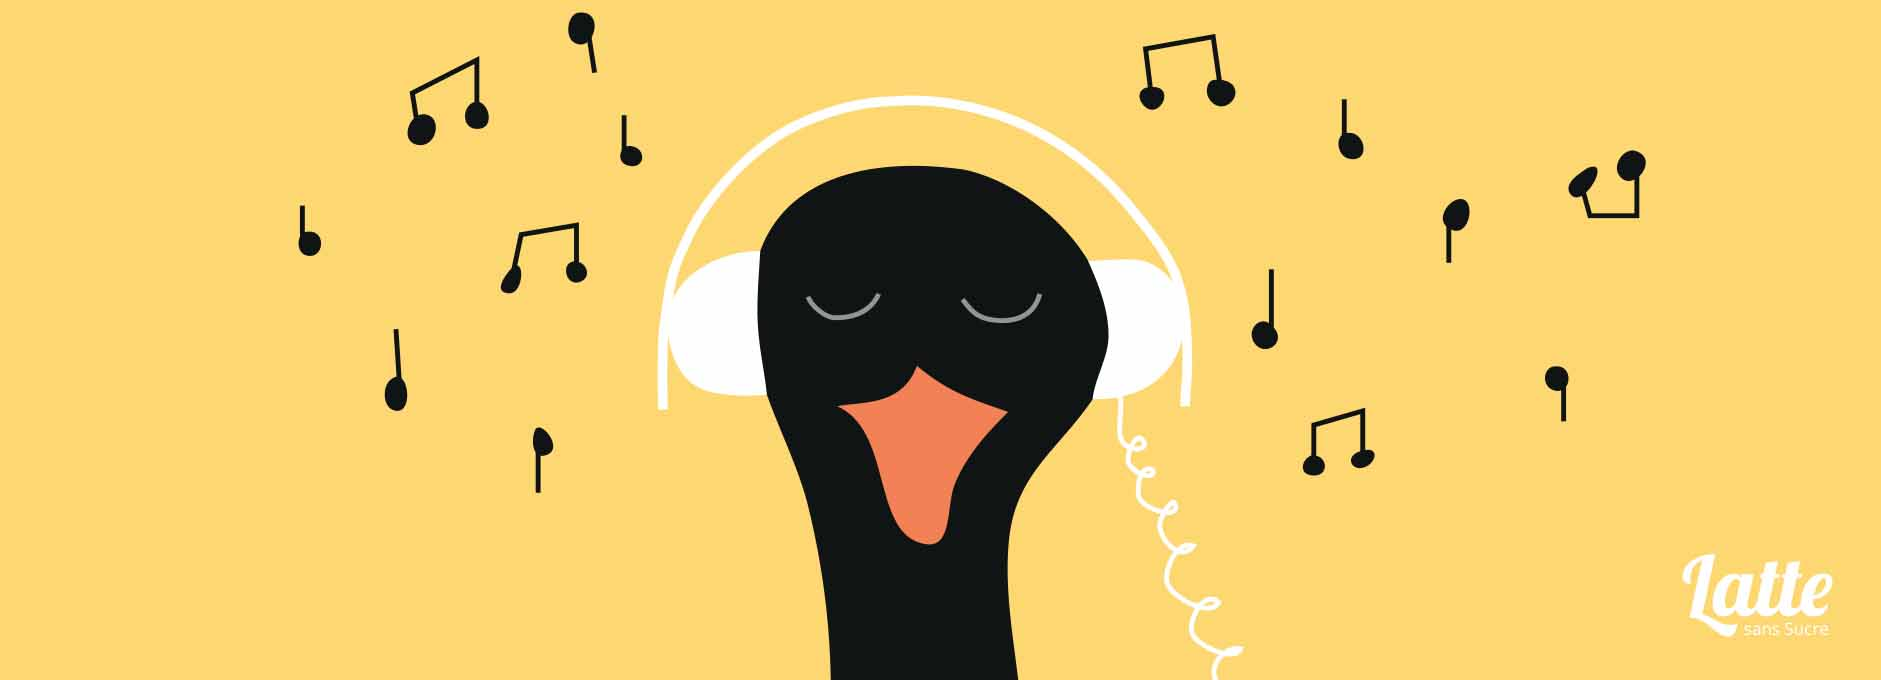 ecouteurs-musique-bureau Grand moment de solitude au bureau